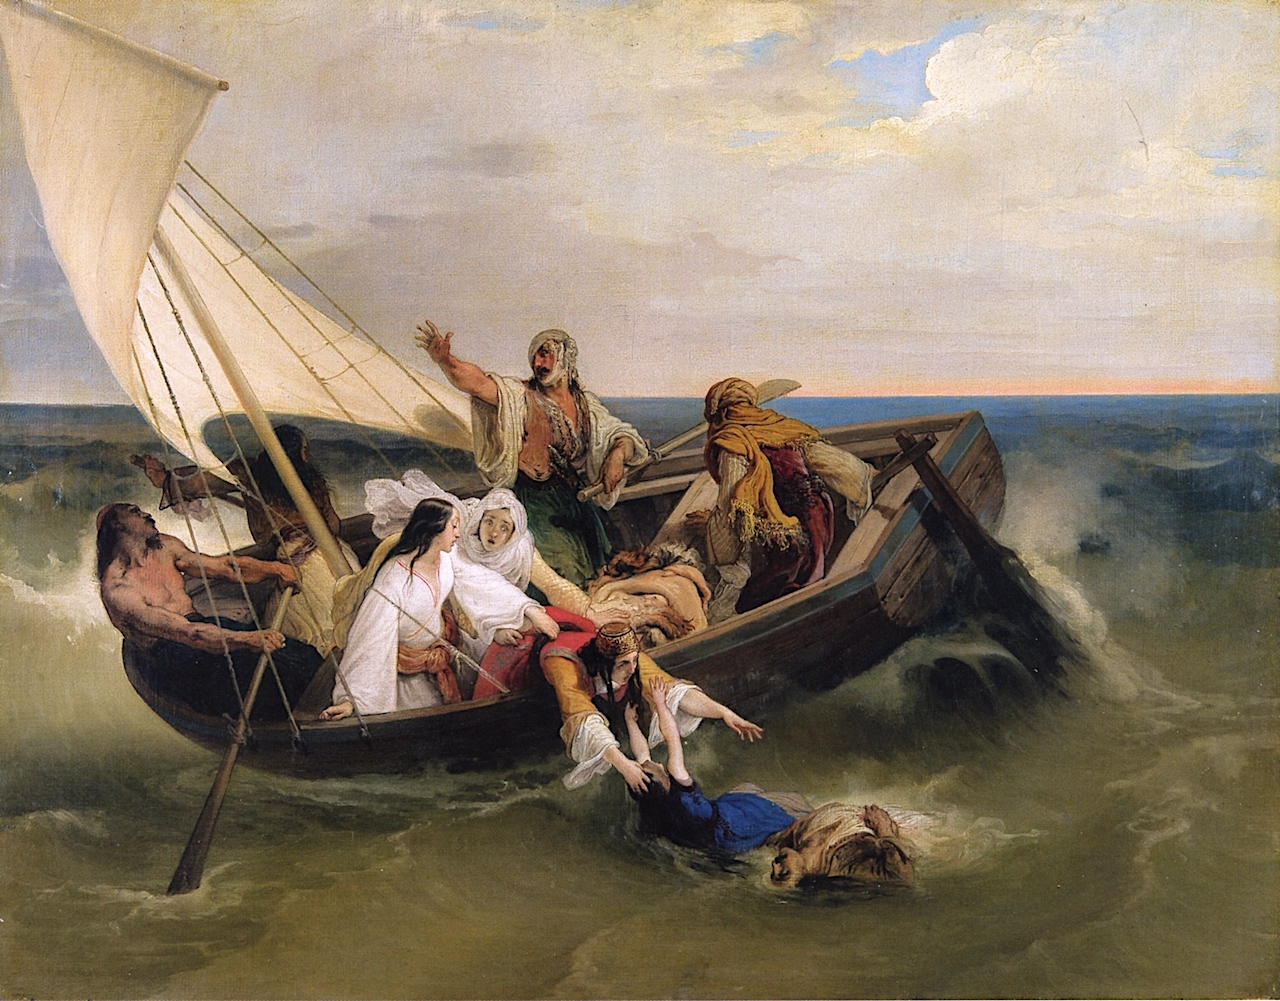 与希腊逃亡者同船(希腊历史上的一集,莫斯科尼著)_Boat with Greek Fugitives (an episode from Greek history by Mosconi)-弗朗切斯科·保罗·海耶兹